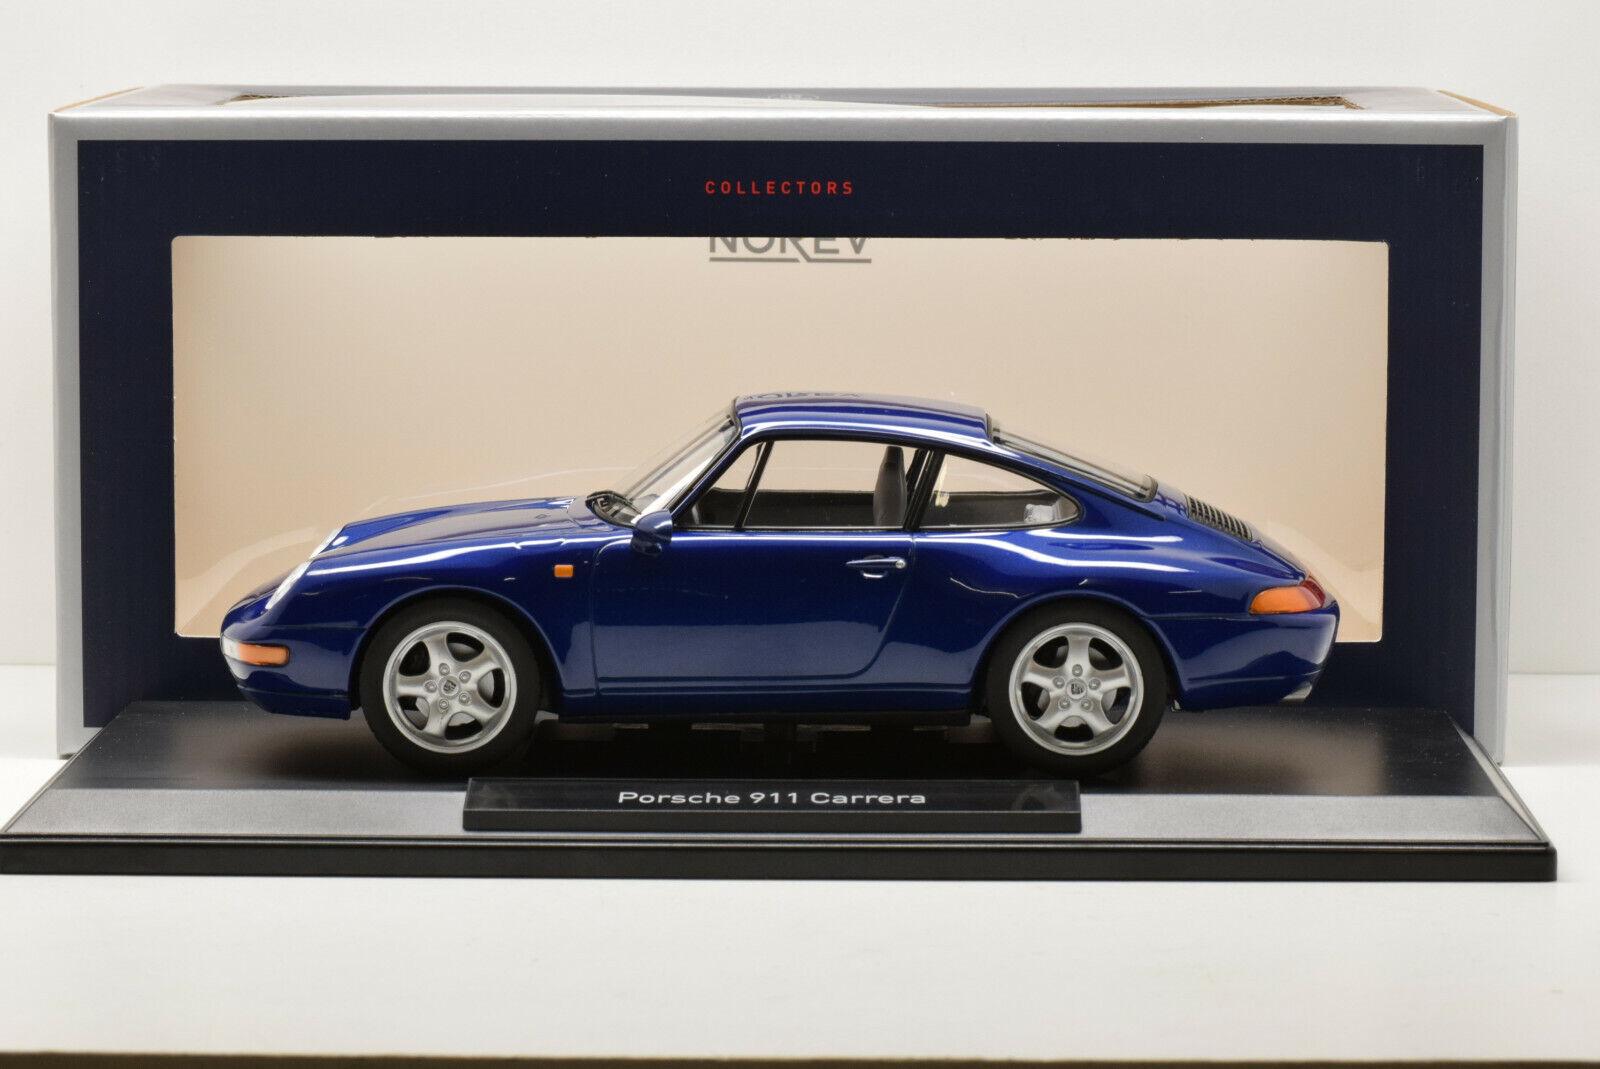 PORSCHE 911 (993) 1993 CARRERA blu METALLIC NOREV 1 18 NEUVE EN BOITE